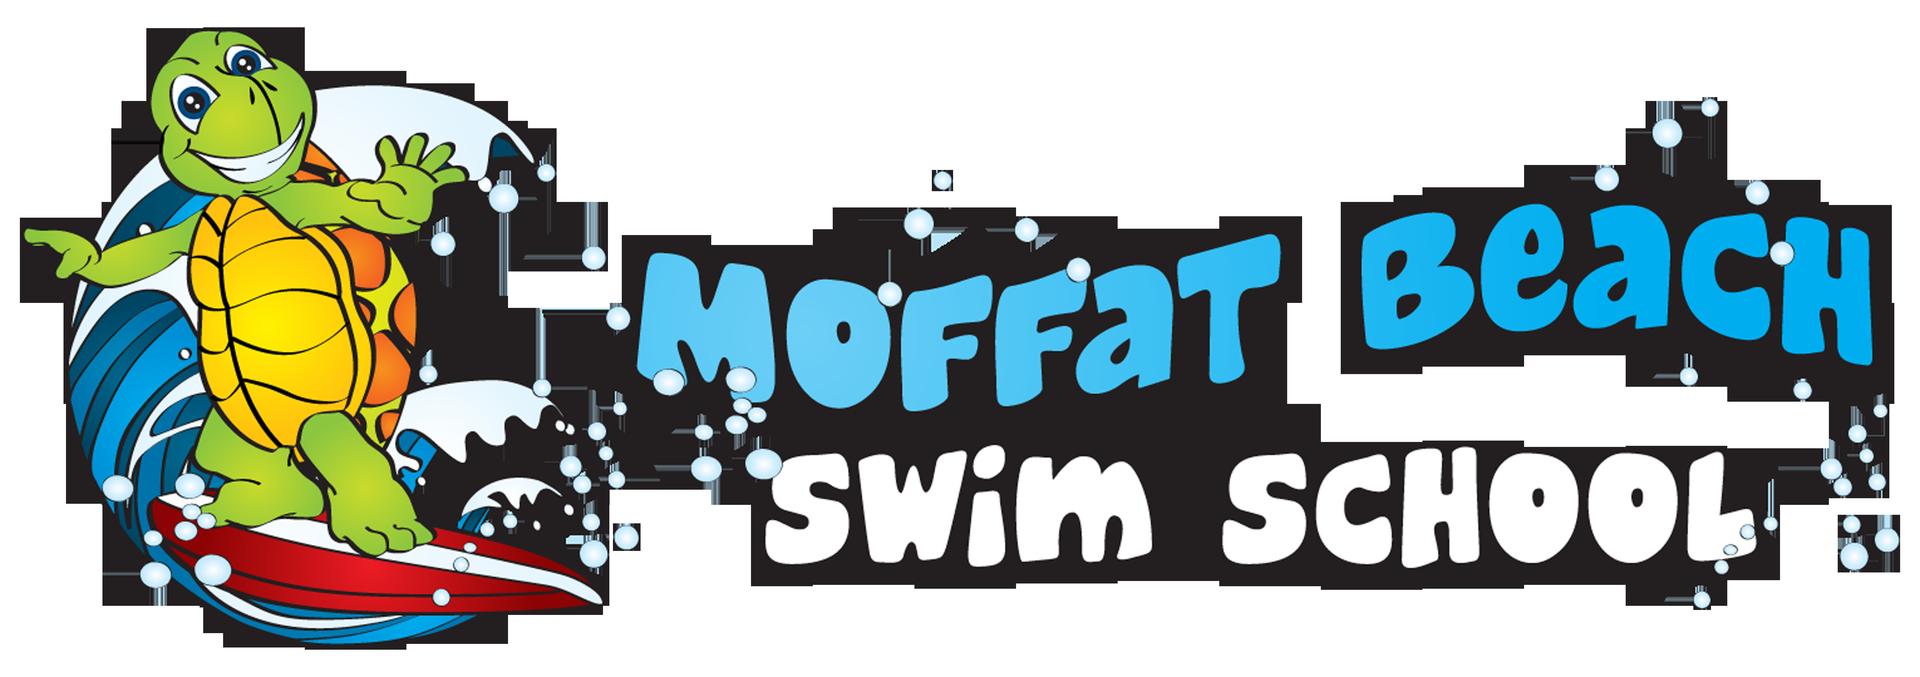 Swimmer clipart beach swimming. Faq s caloundra swim